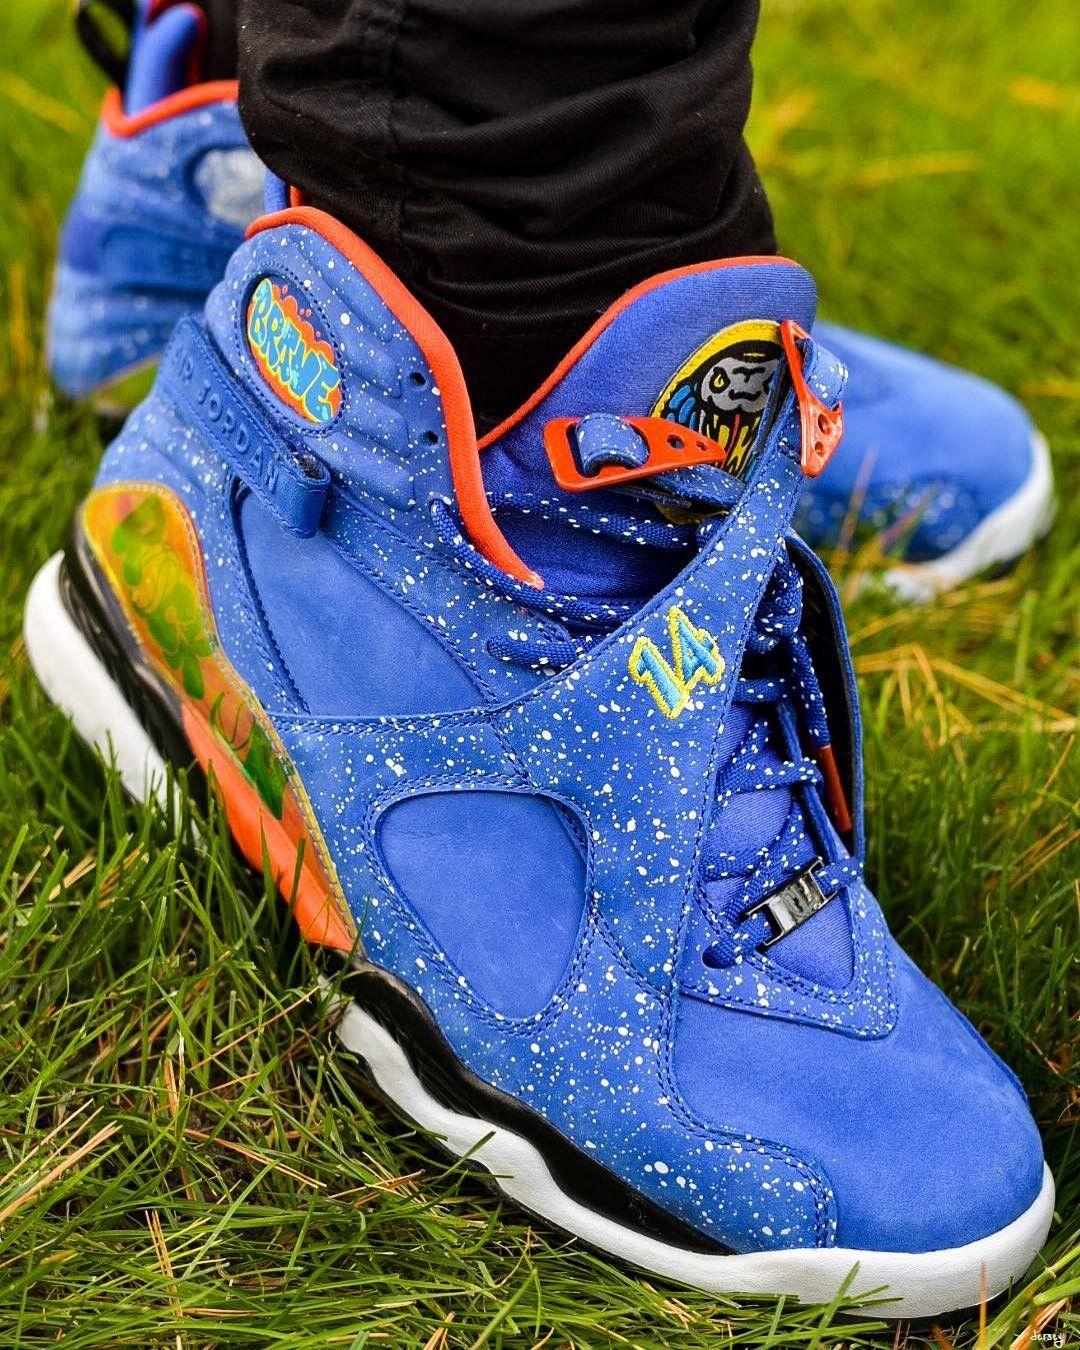 pretty nice a048e 365aa Air Jordan 8 retro Doernbecher | Sneakers in 2019 | Shoes ...